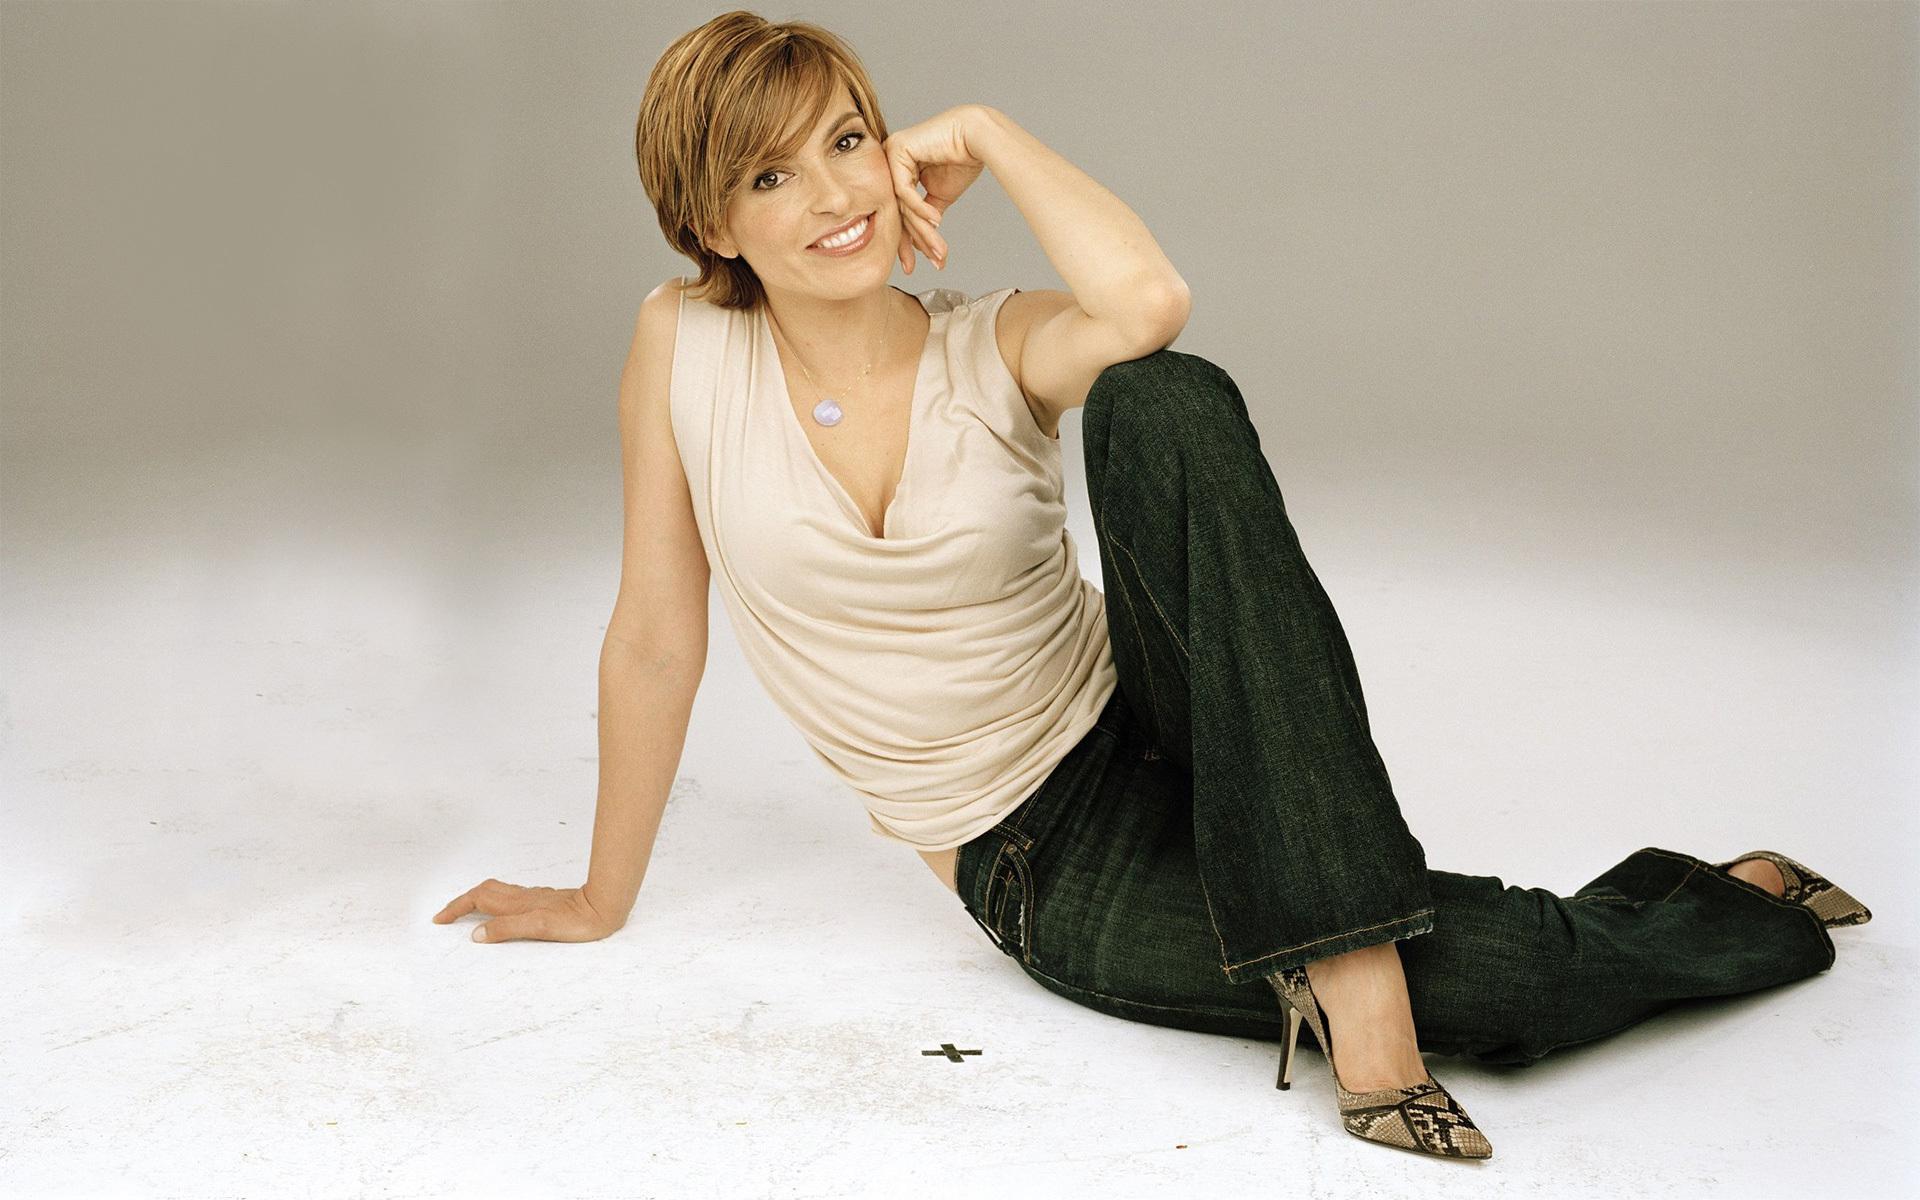 Pictures Of Mariska Hargitay